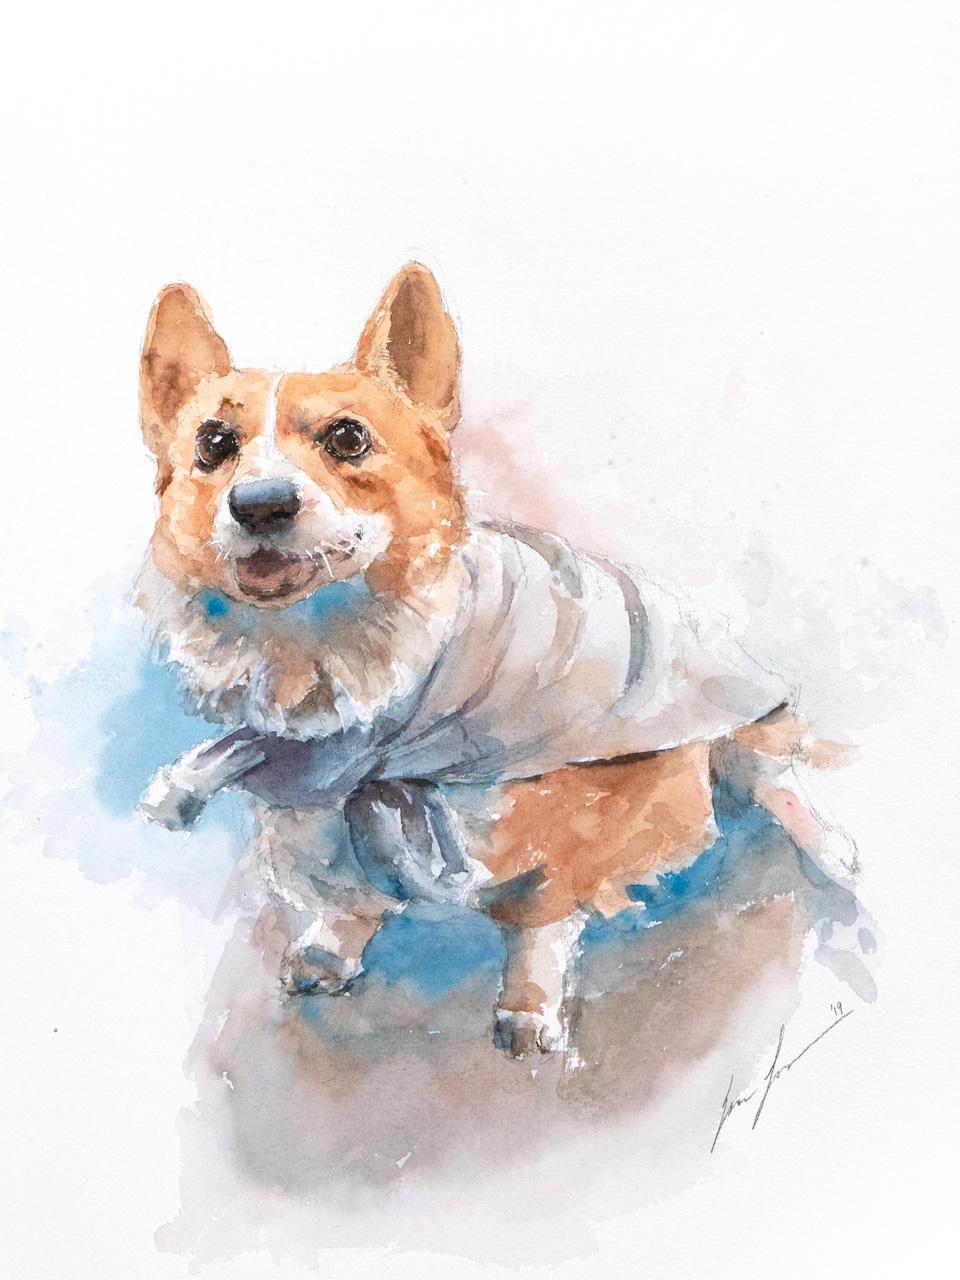 Pet Portrait is also very popular!